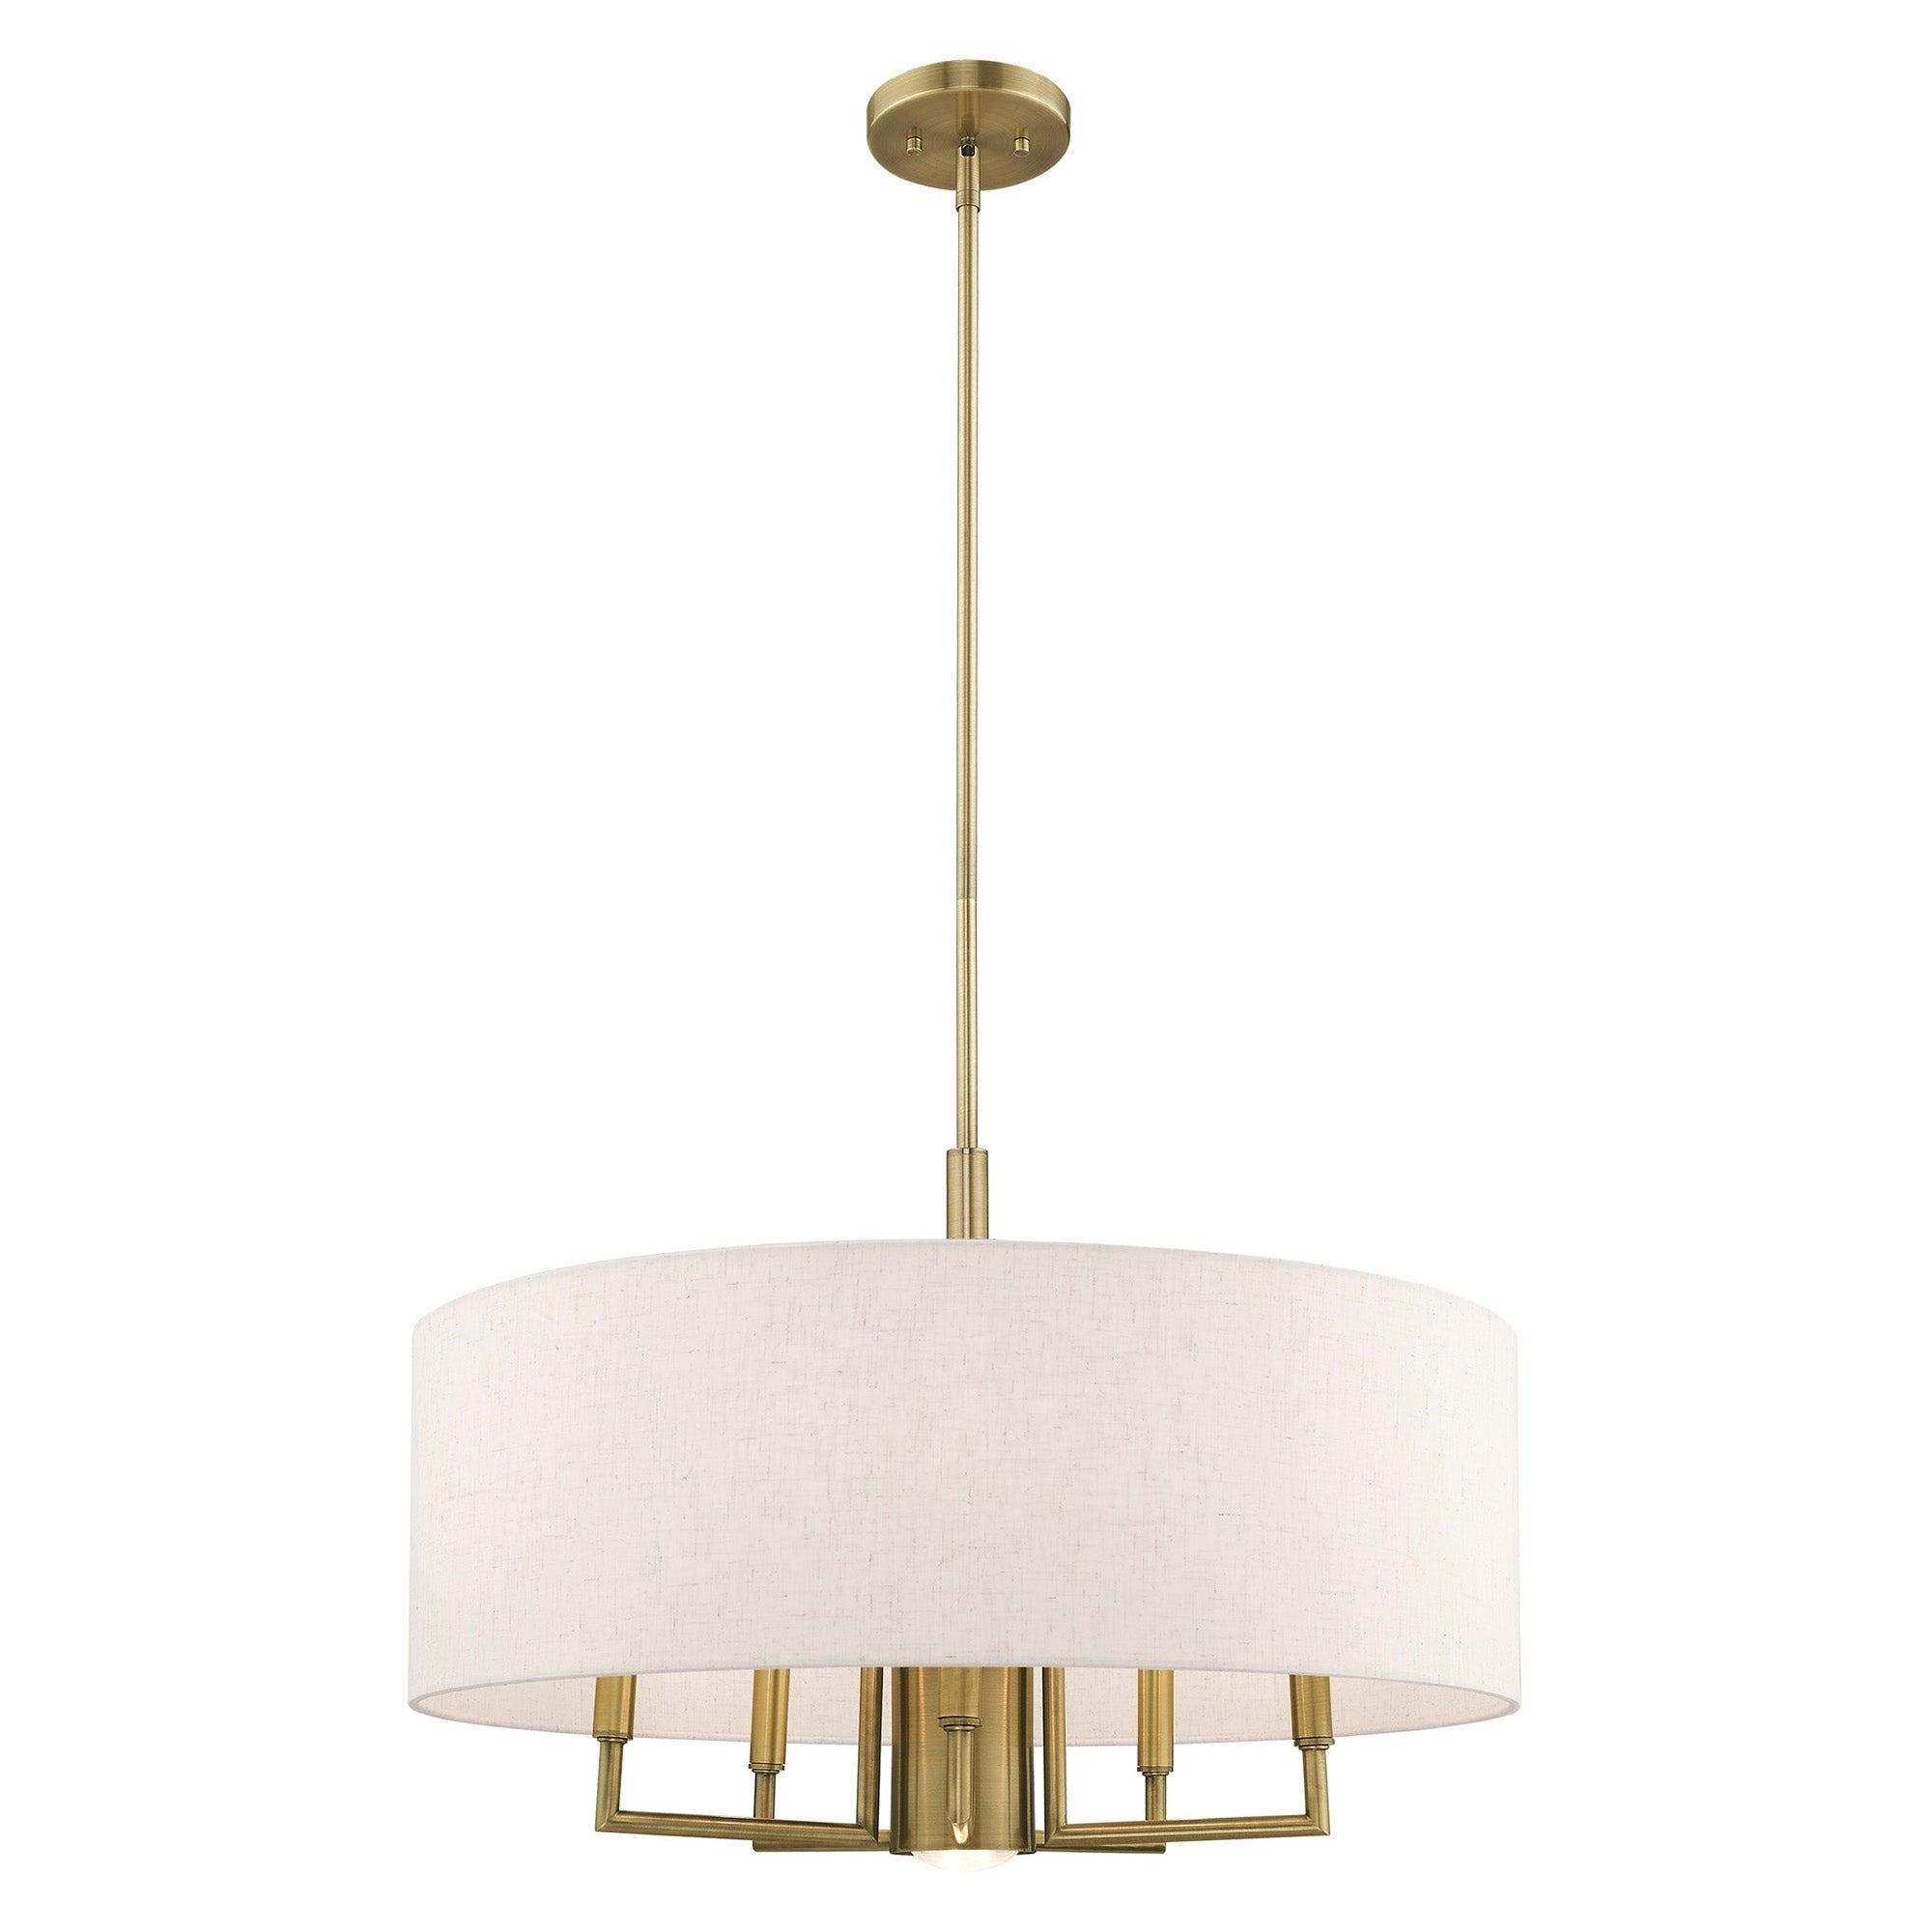 Livex Lighting Meridian 6 Light Oatmeal Drum Shade Pendant Chandelier 24 Dia X 5 54 Adj H